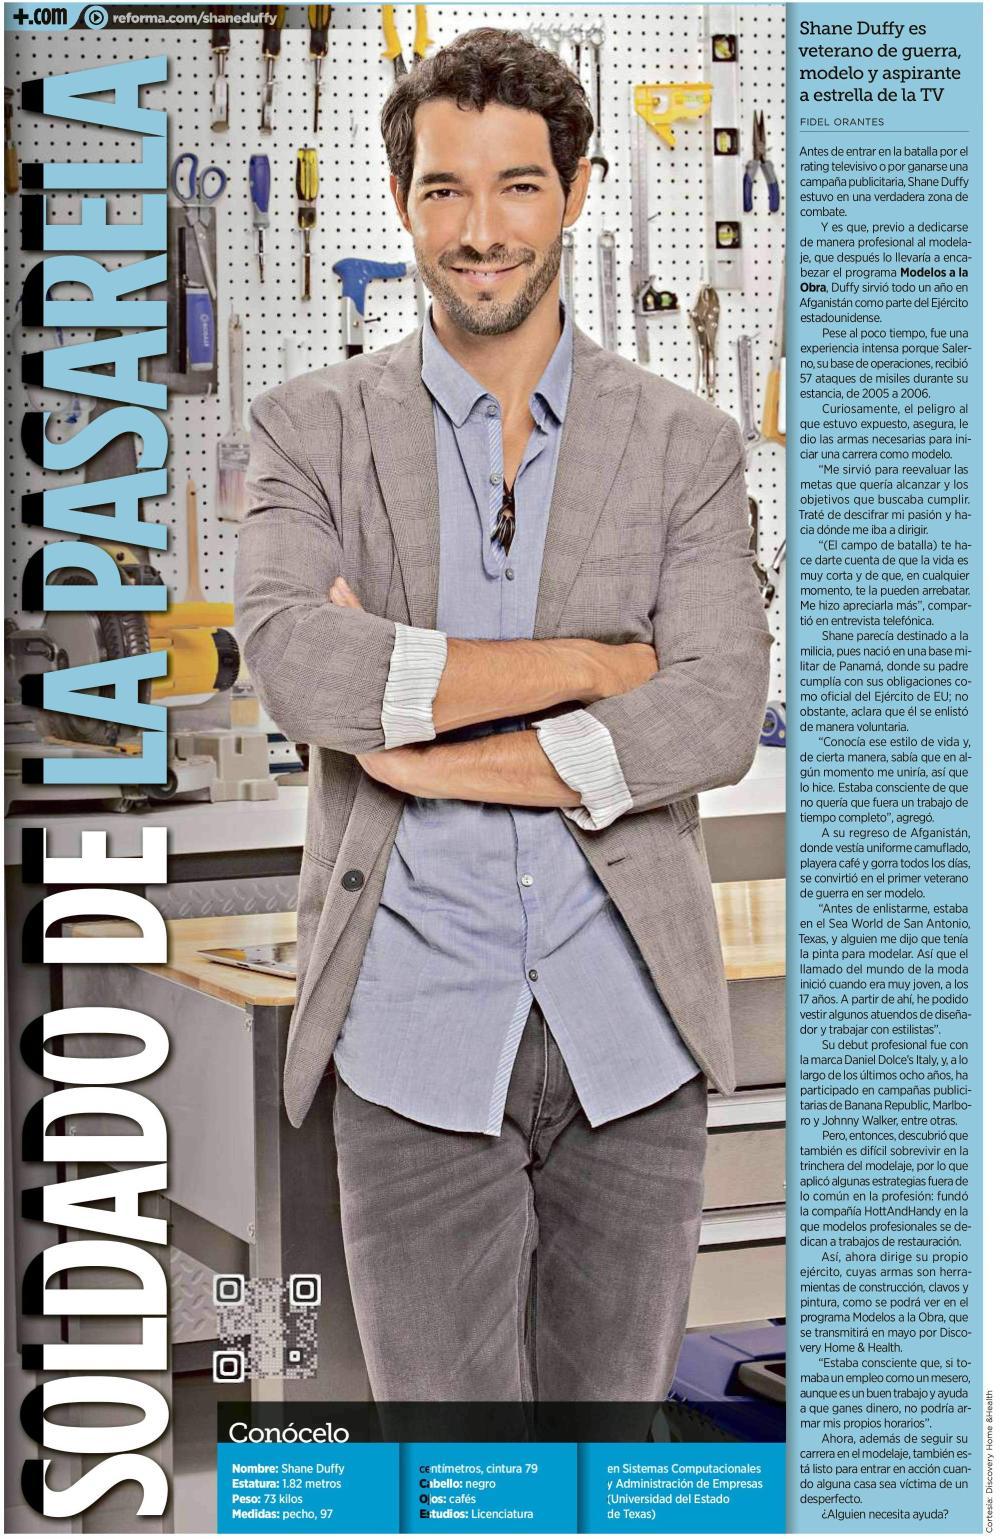 Reforma 28 04 14.jpg